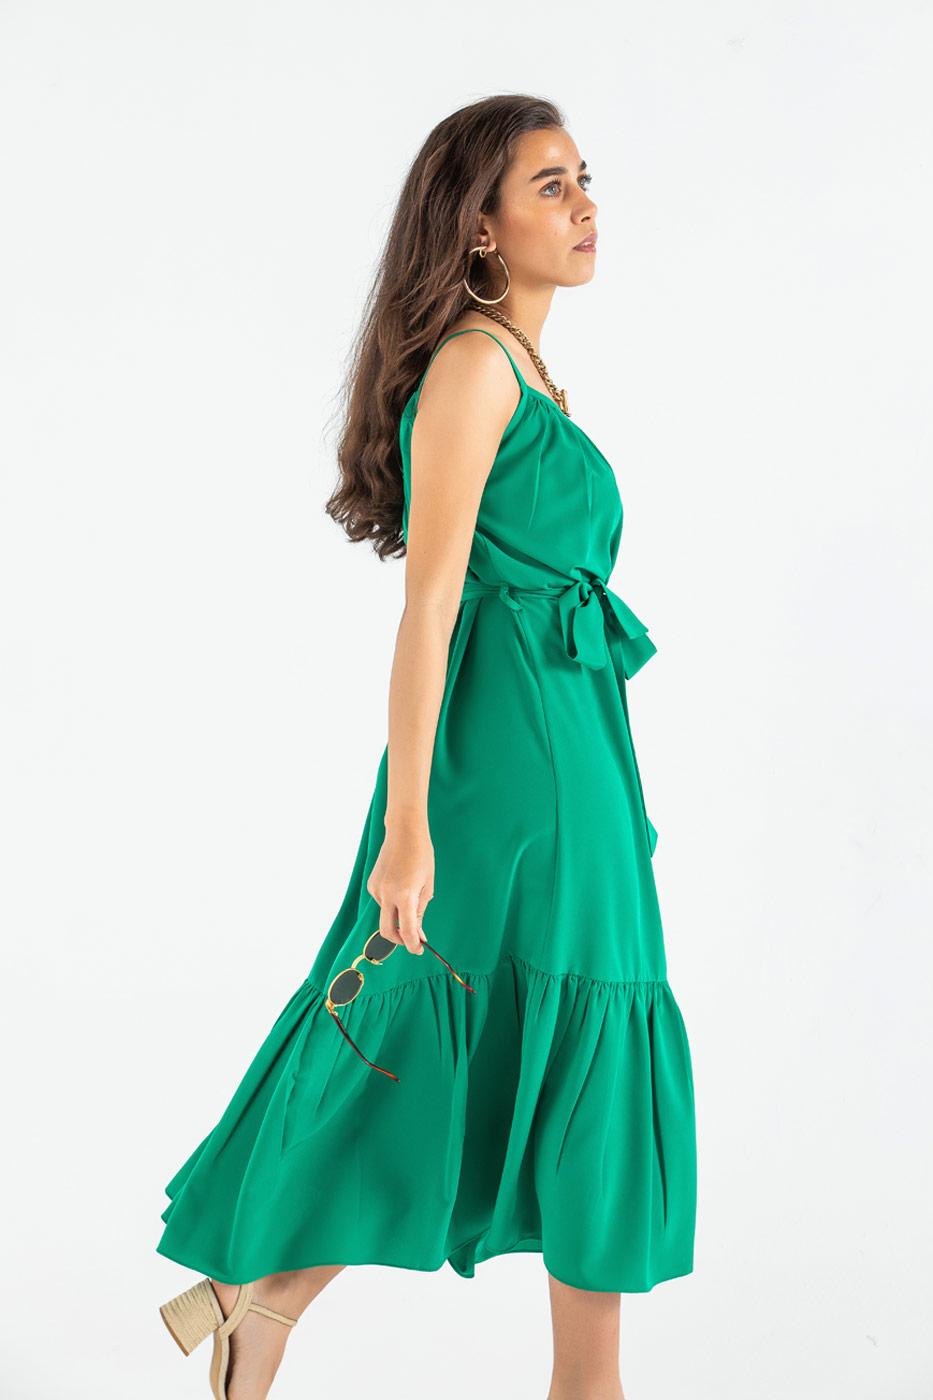 Twrill Around Emerlad Green Dress thumbnail